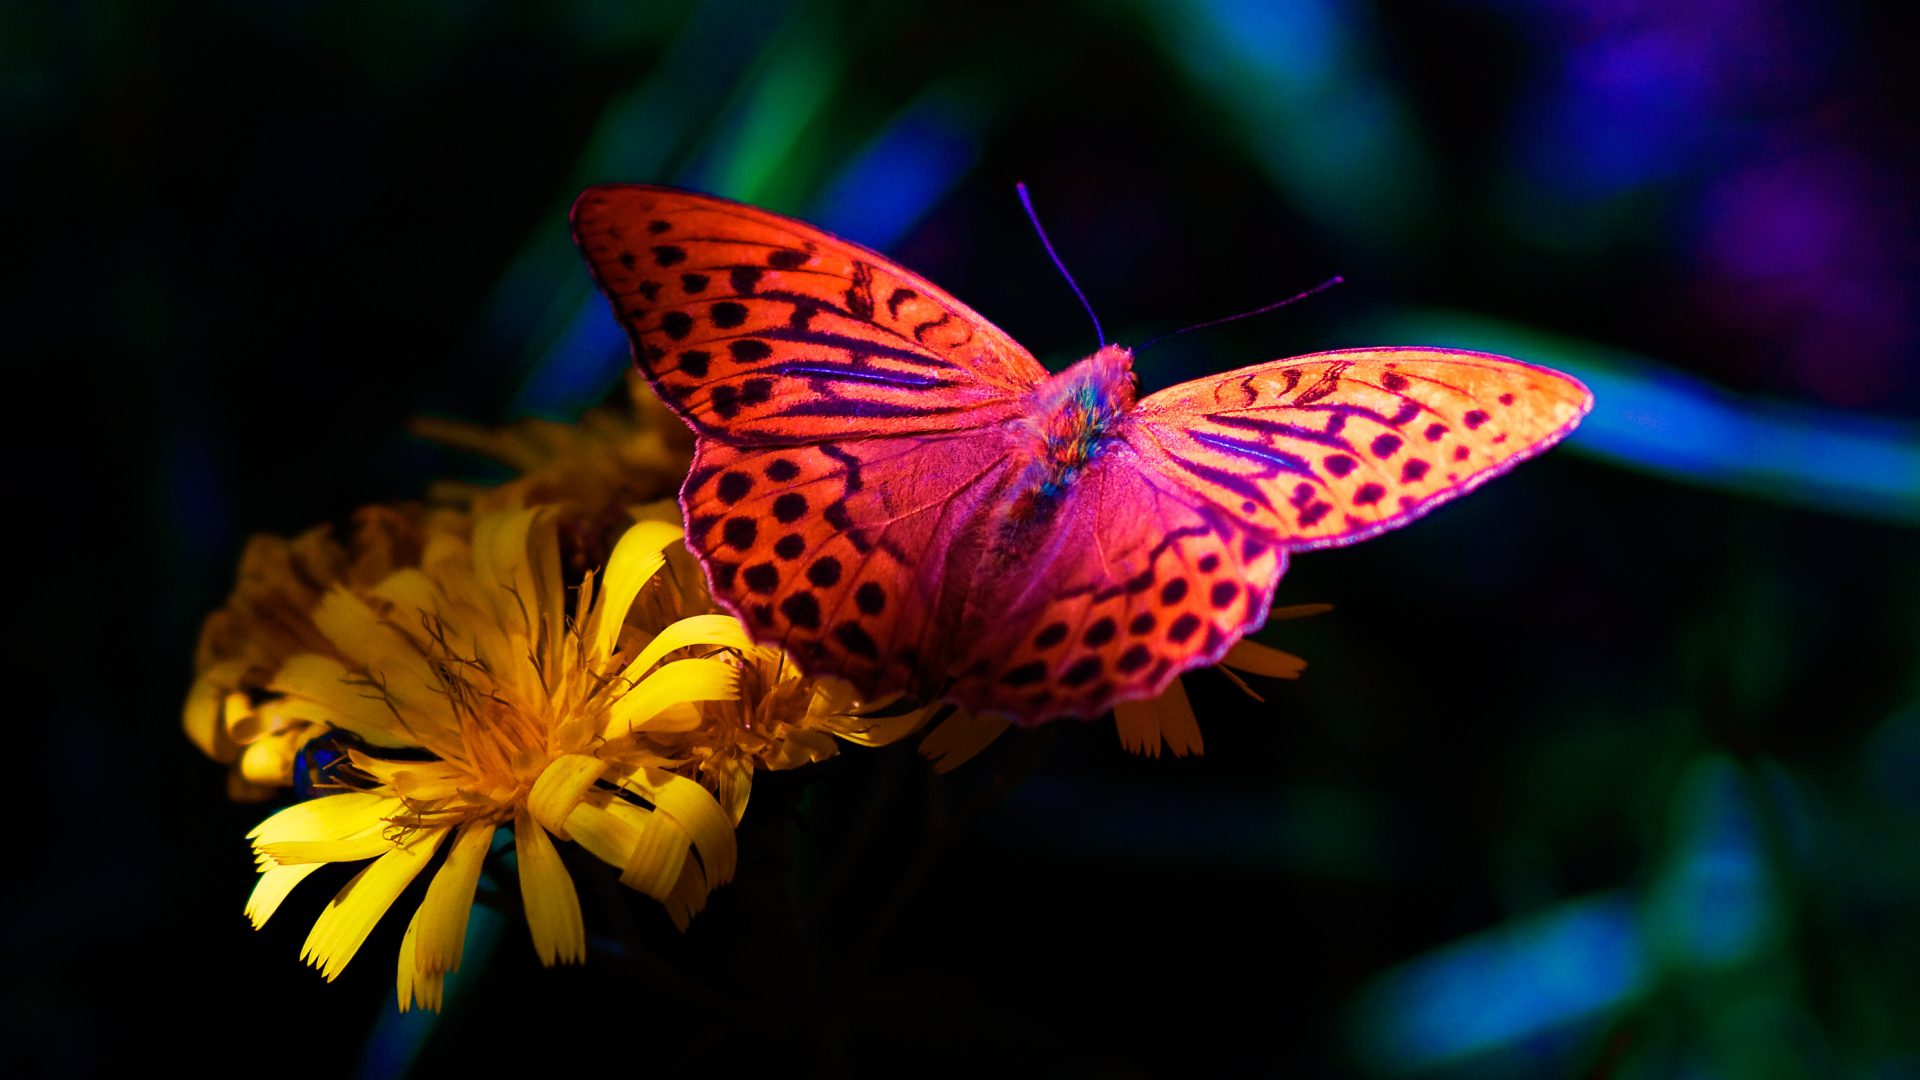 desktop wallpaper hd 3d full screen free download,moths and butterflies,butterfly,cynthia (subgenus),insect,invertebrate